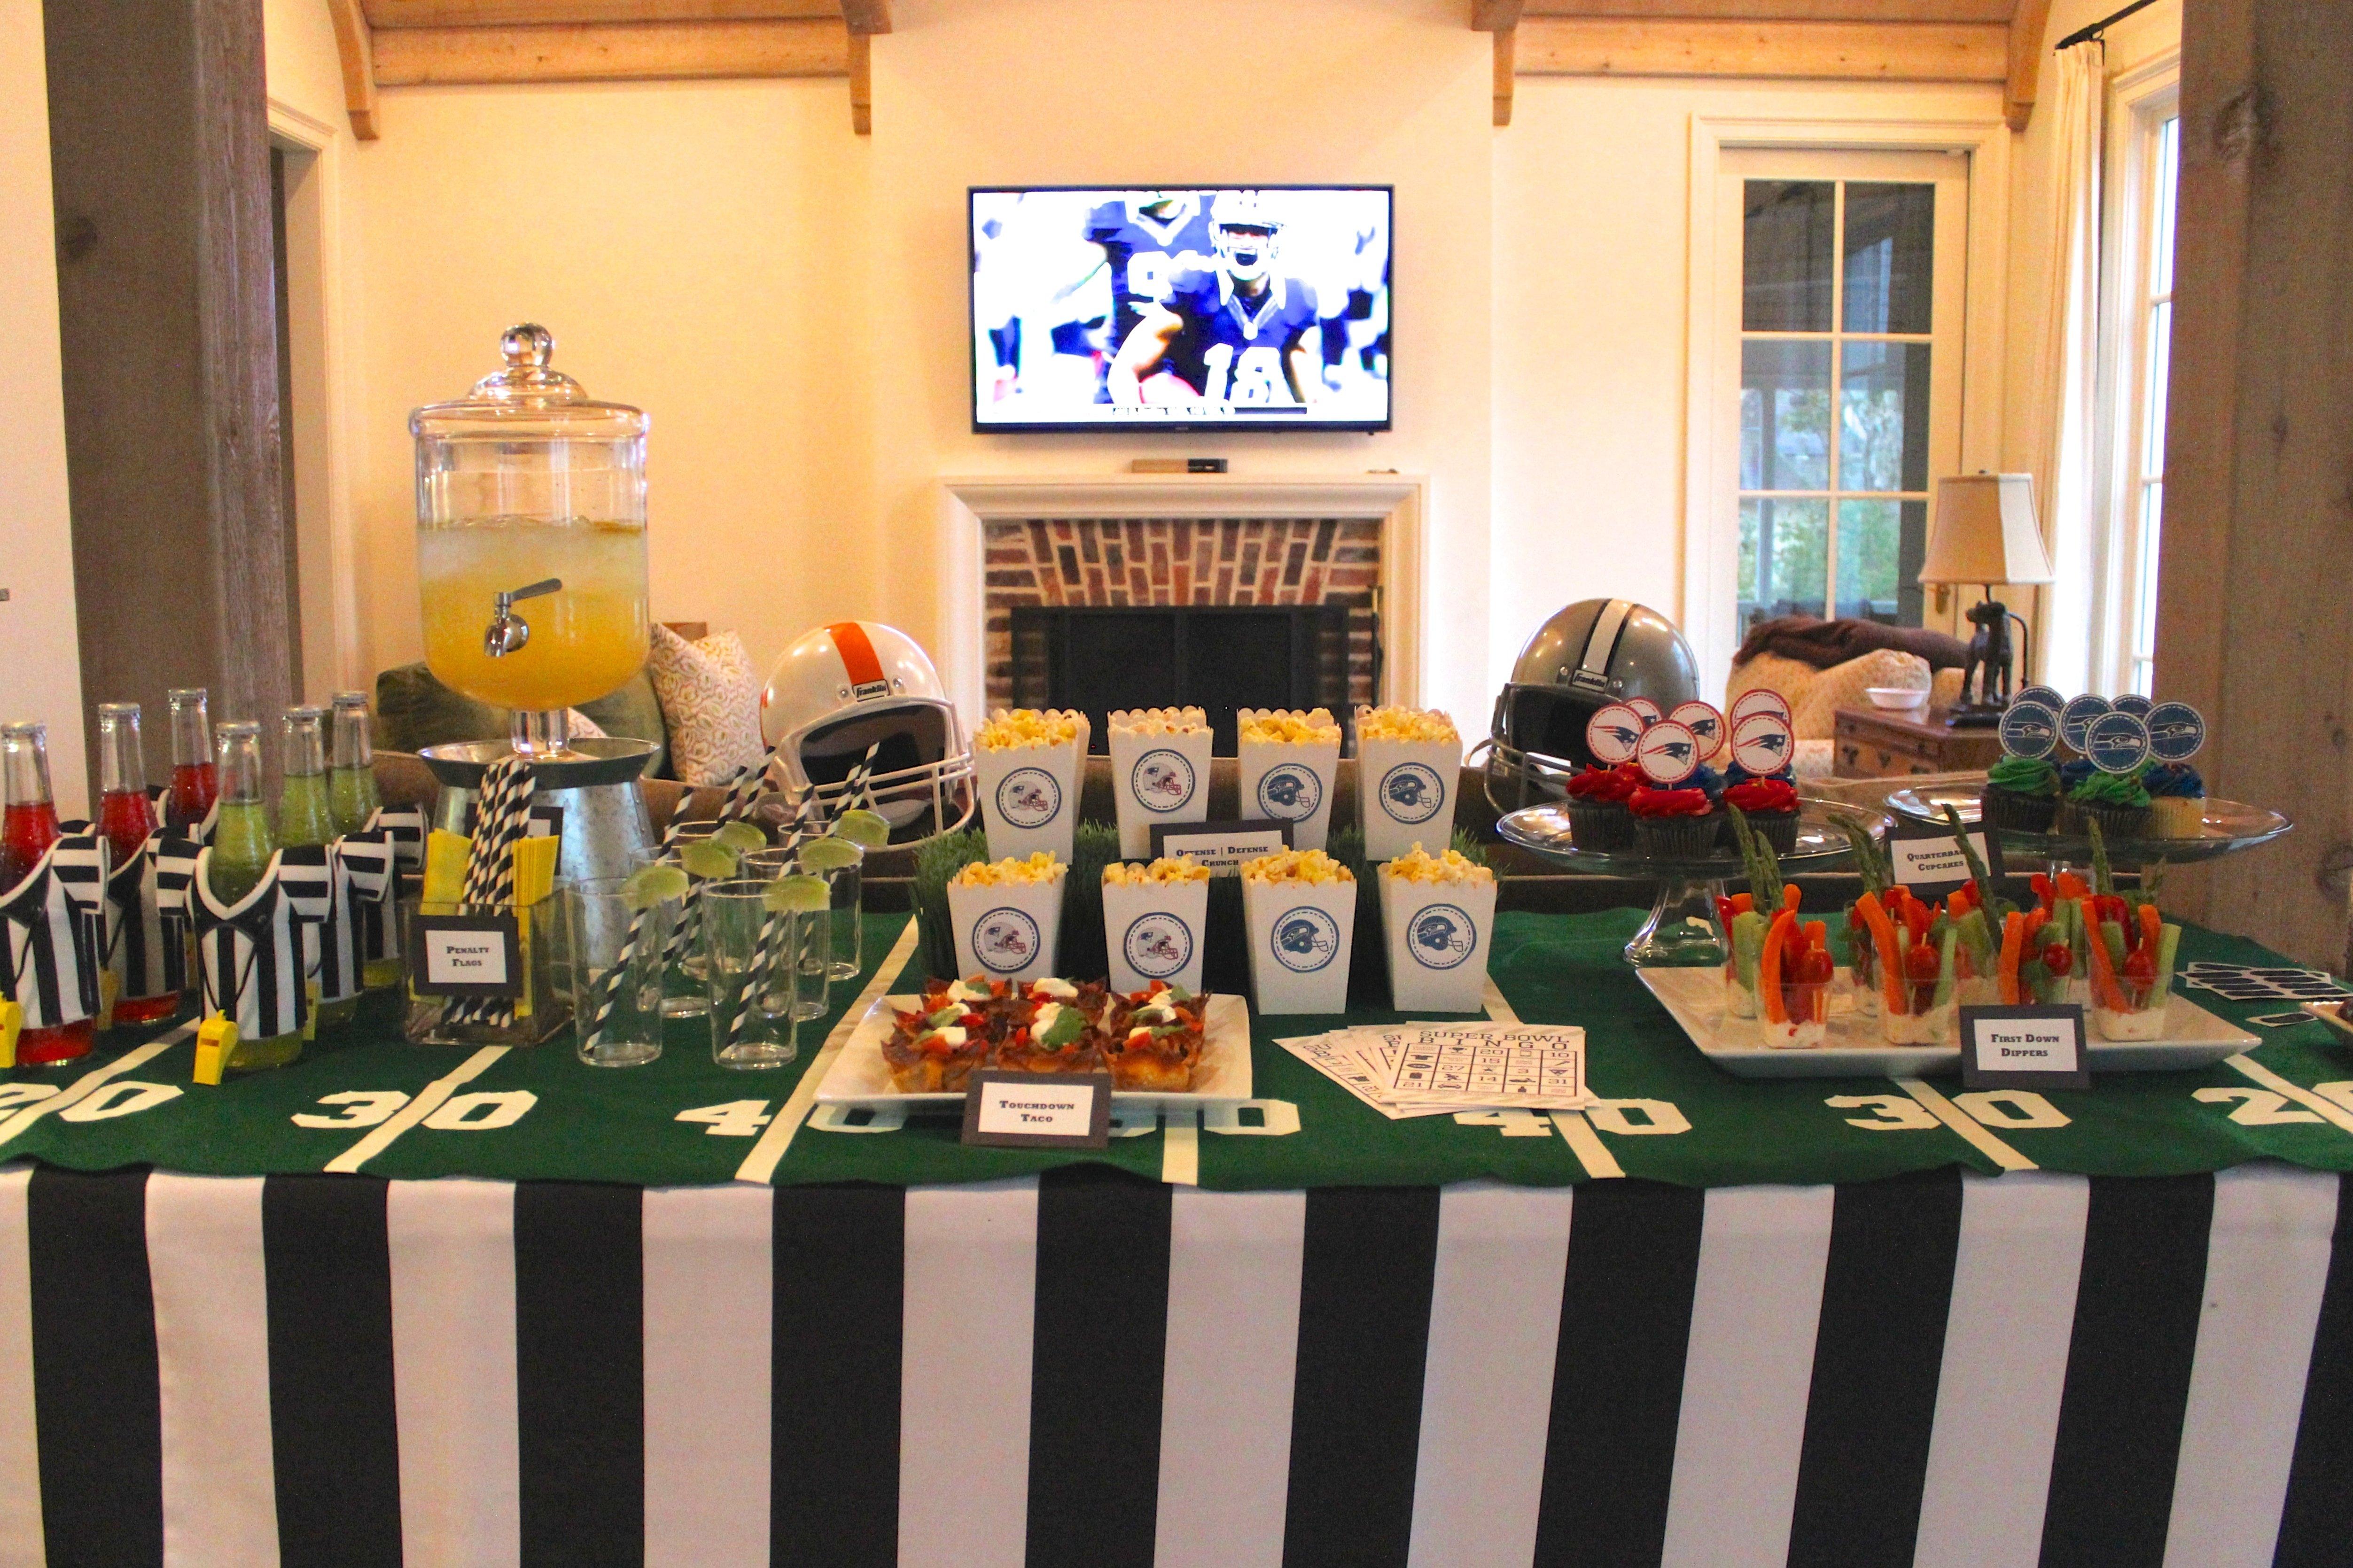 10 Amazing Super Bowl Party Decorating Ideas decorating a winning super bowl party ideas lifestyle